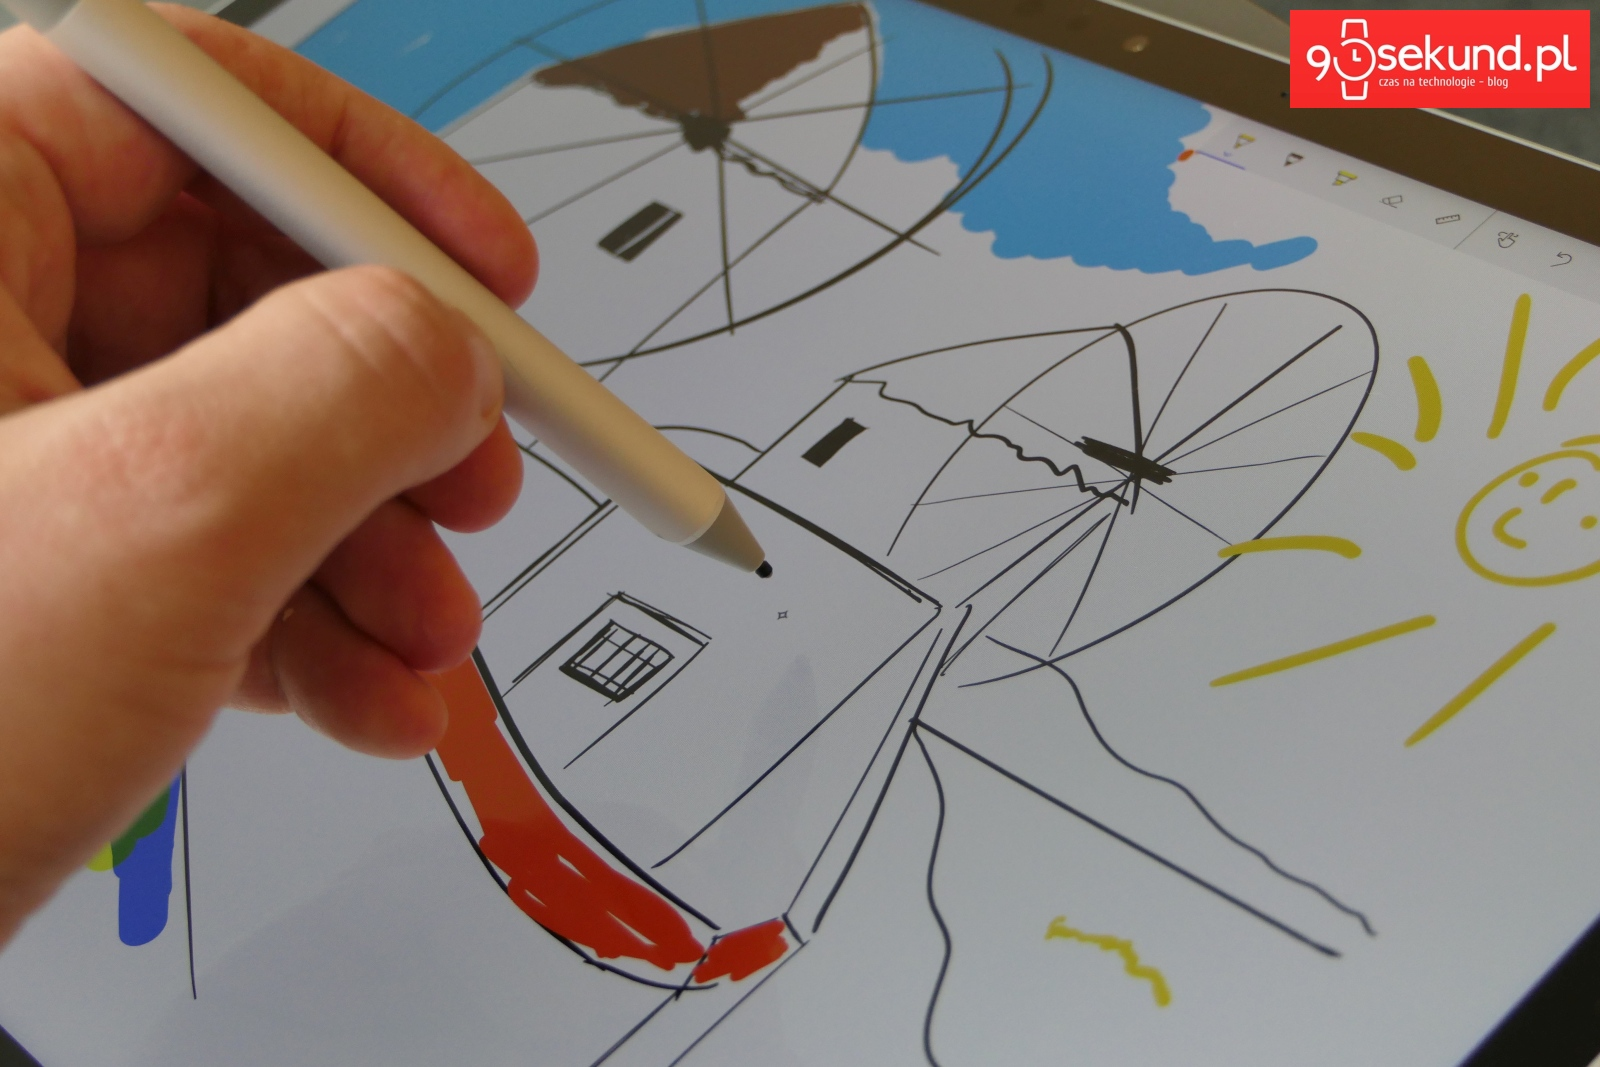 Surface Pen - Michał Brożyński - 90sekund.pl